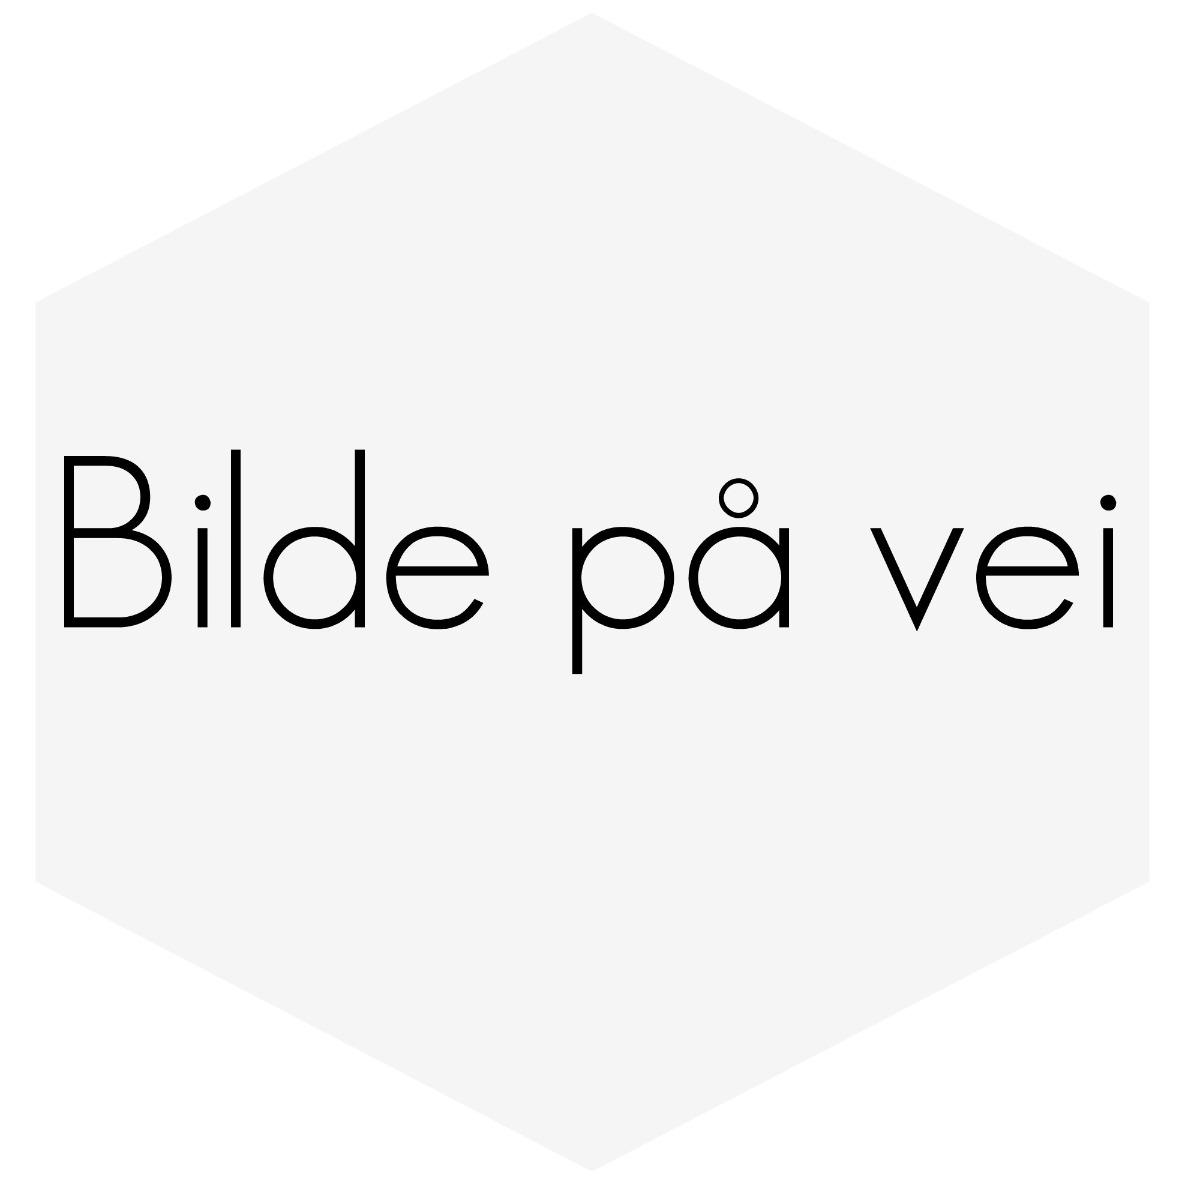 ENDELEDD YTRE PÅ TANNSTANG 2/7/900 KG-KVAL.